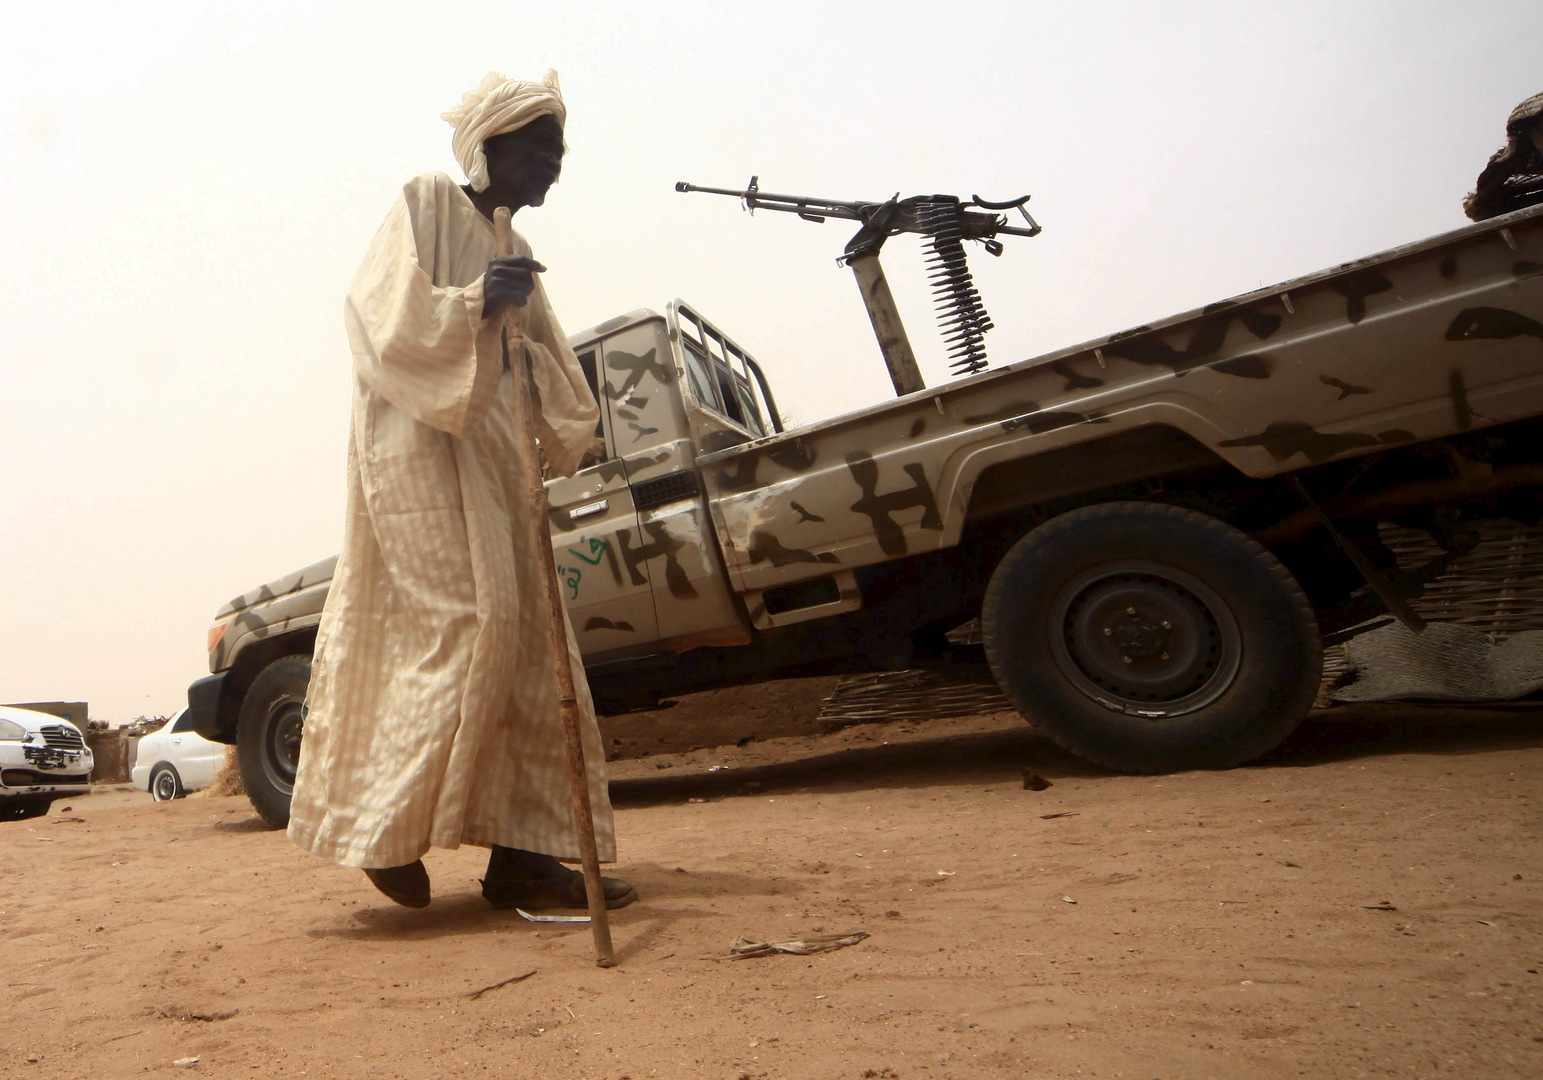 رجل يمشي بجانب آلية عليها رشاش في دارفور بالسودان